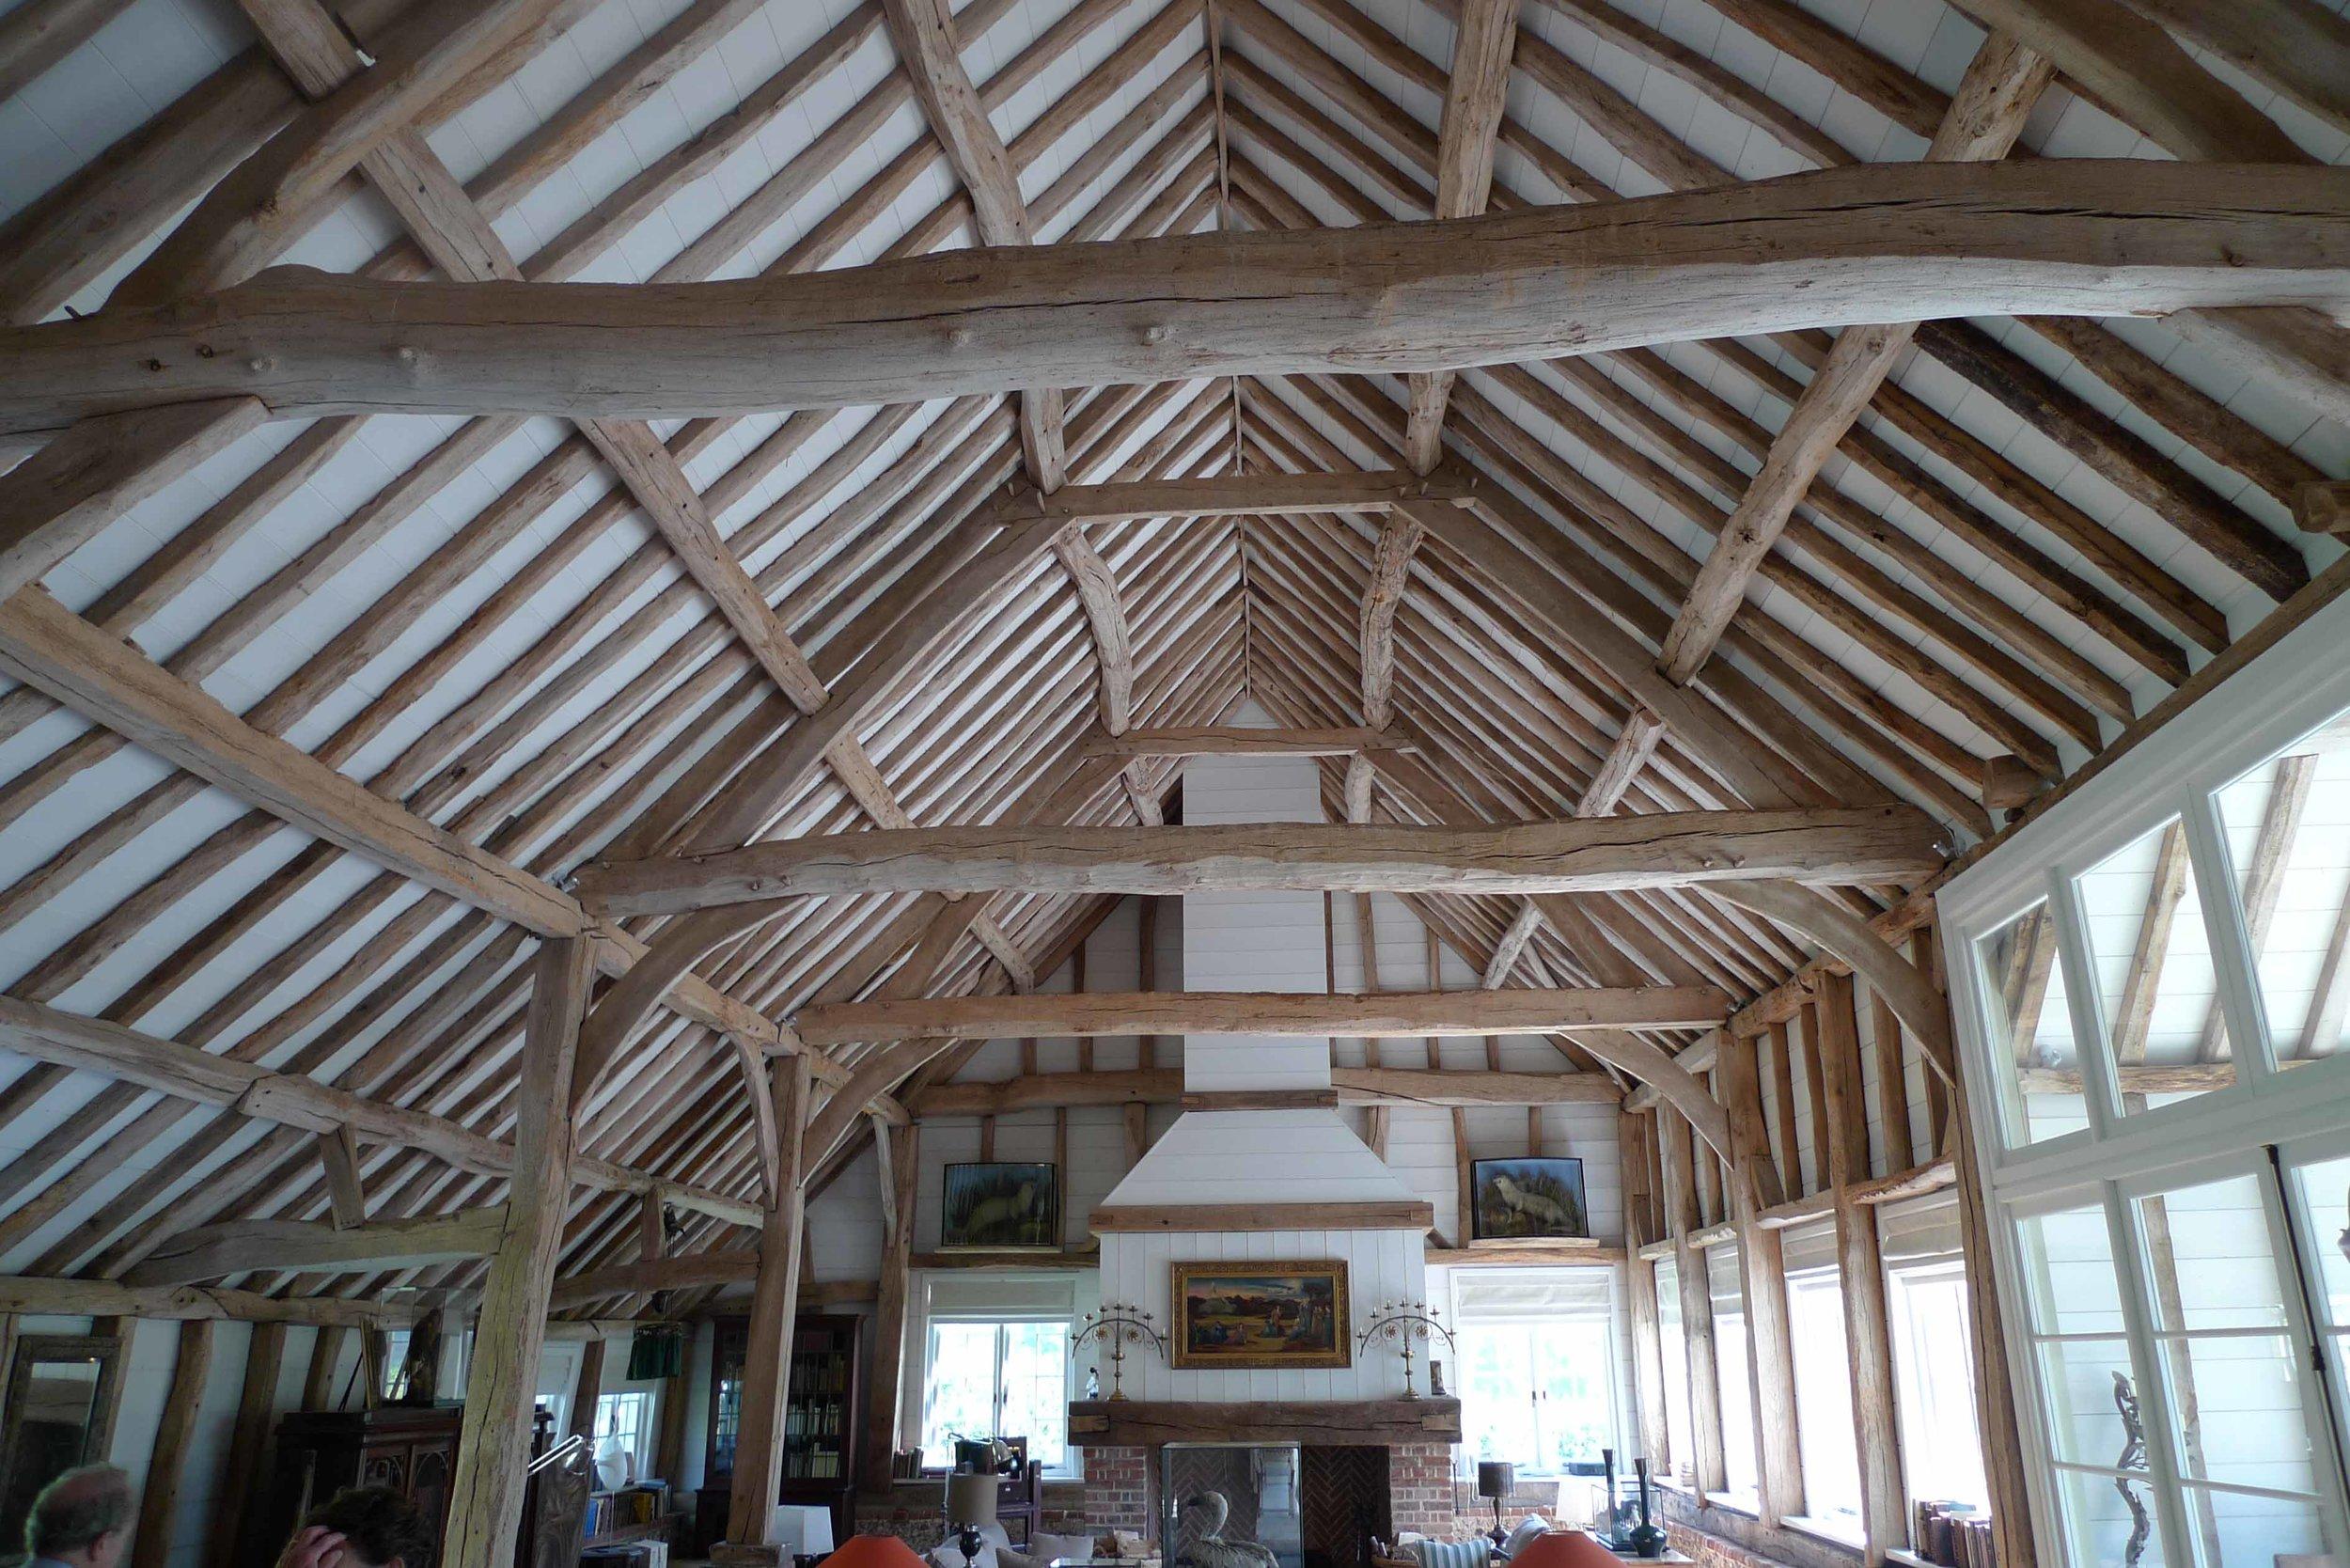 Main barn interior after construction